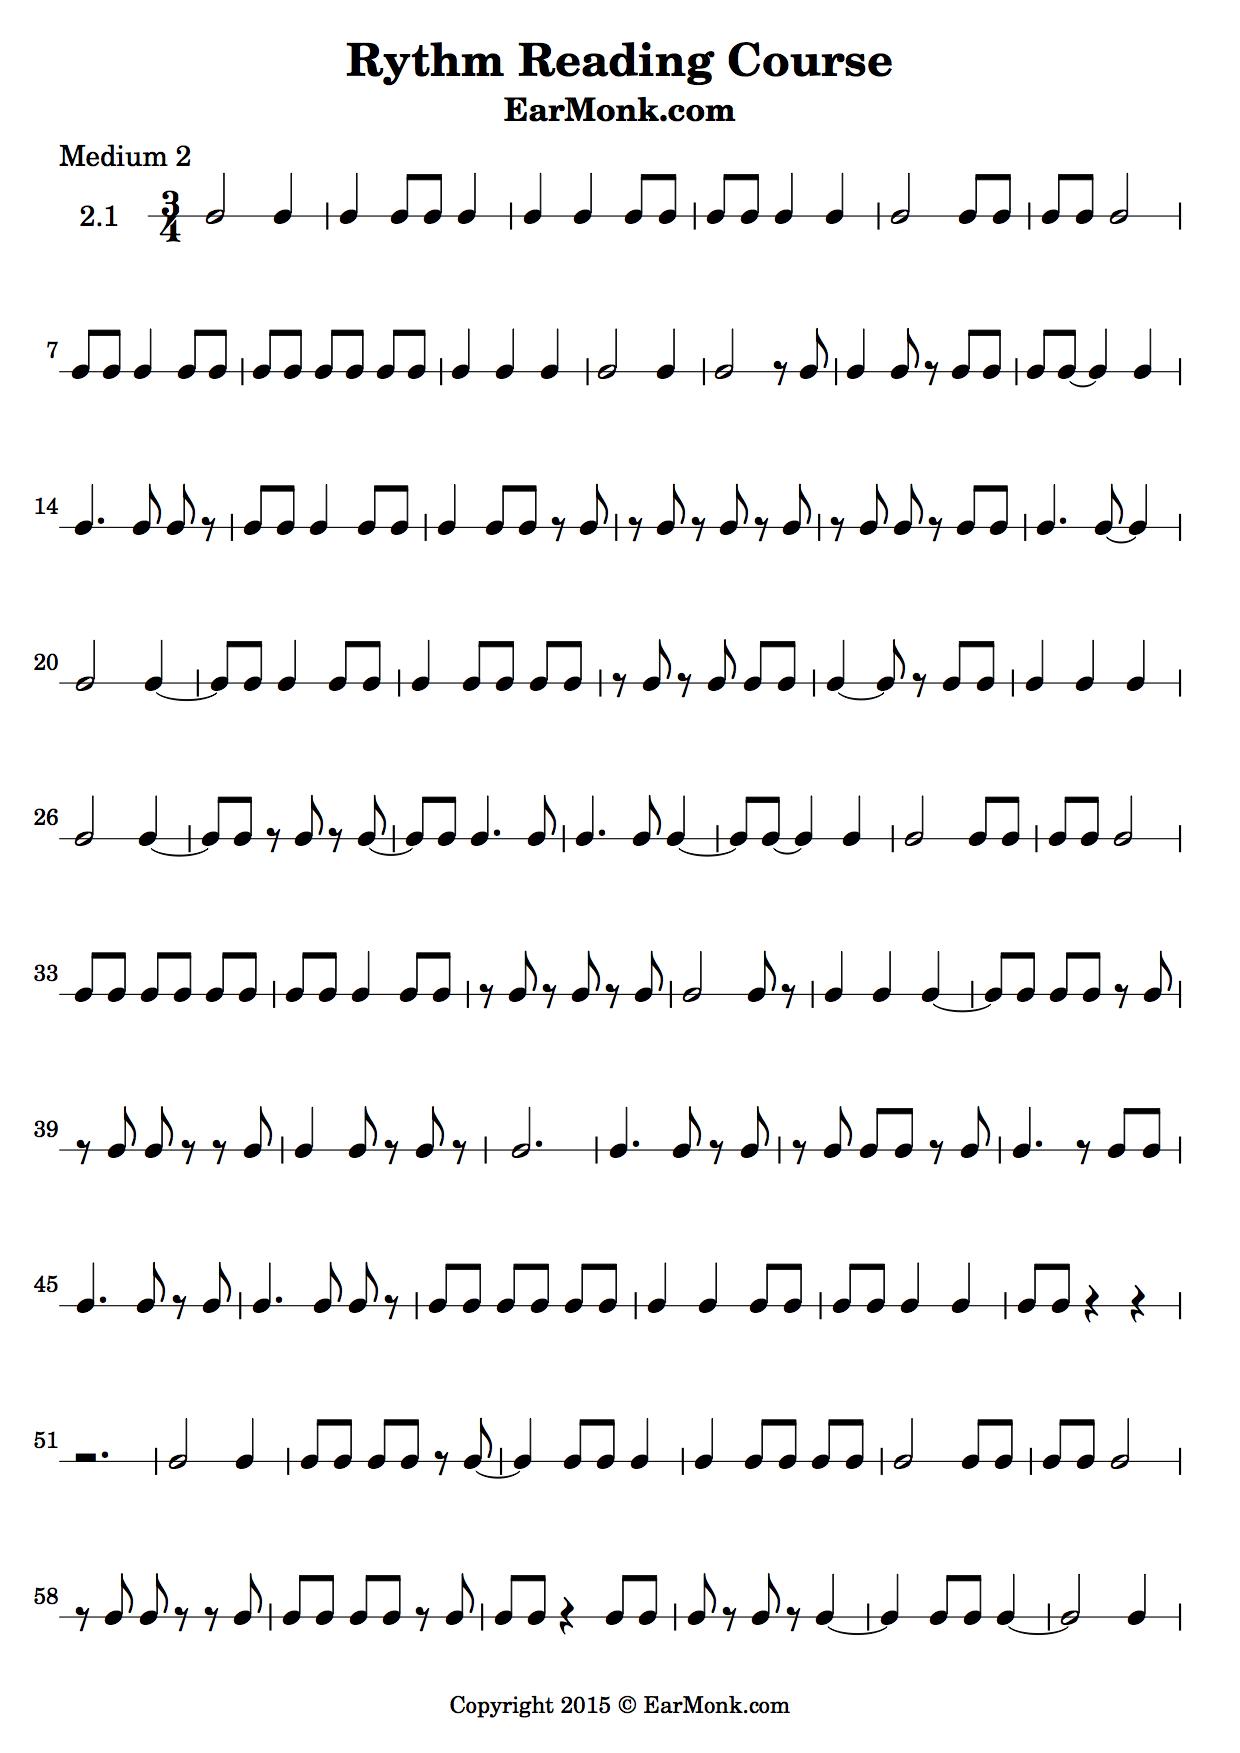 Rhythm Exercise Medium 2